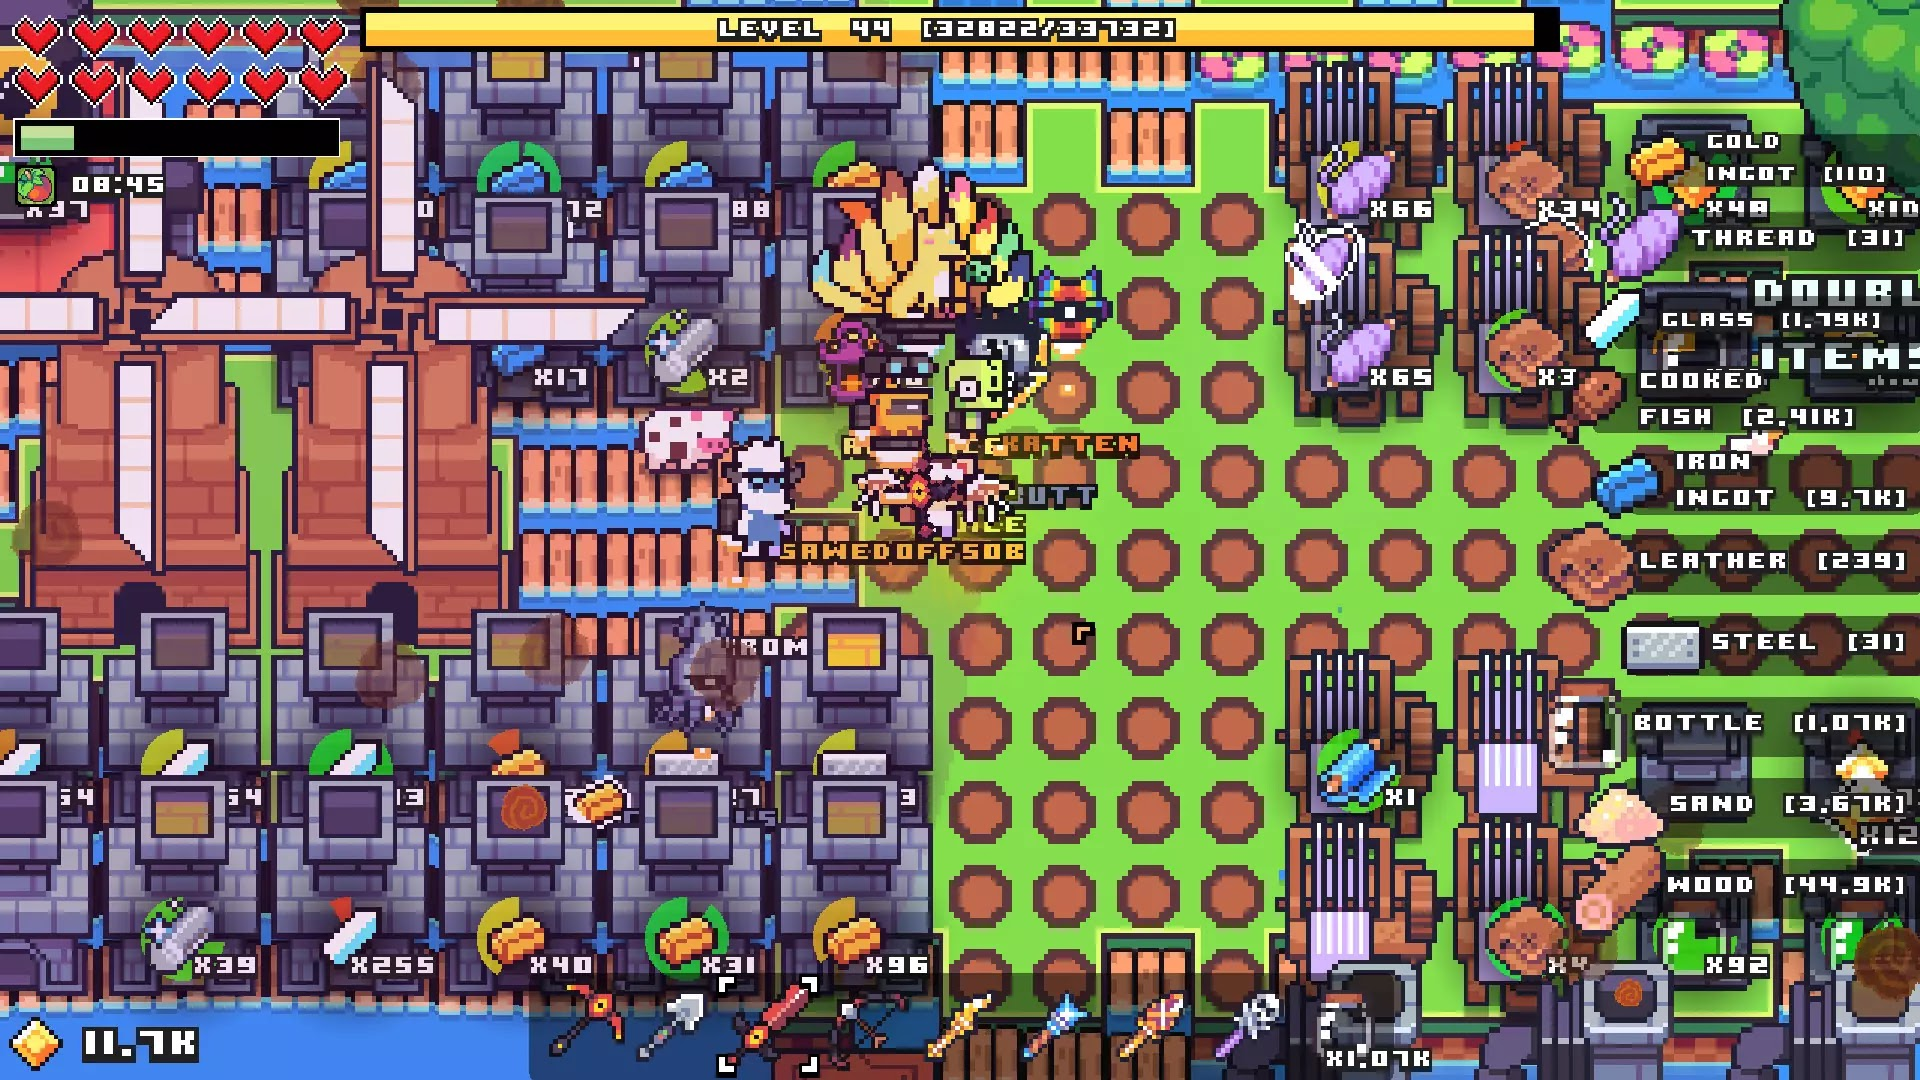 Forager game screenshots